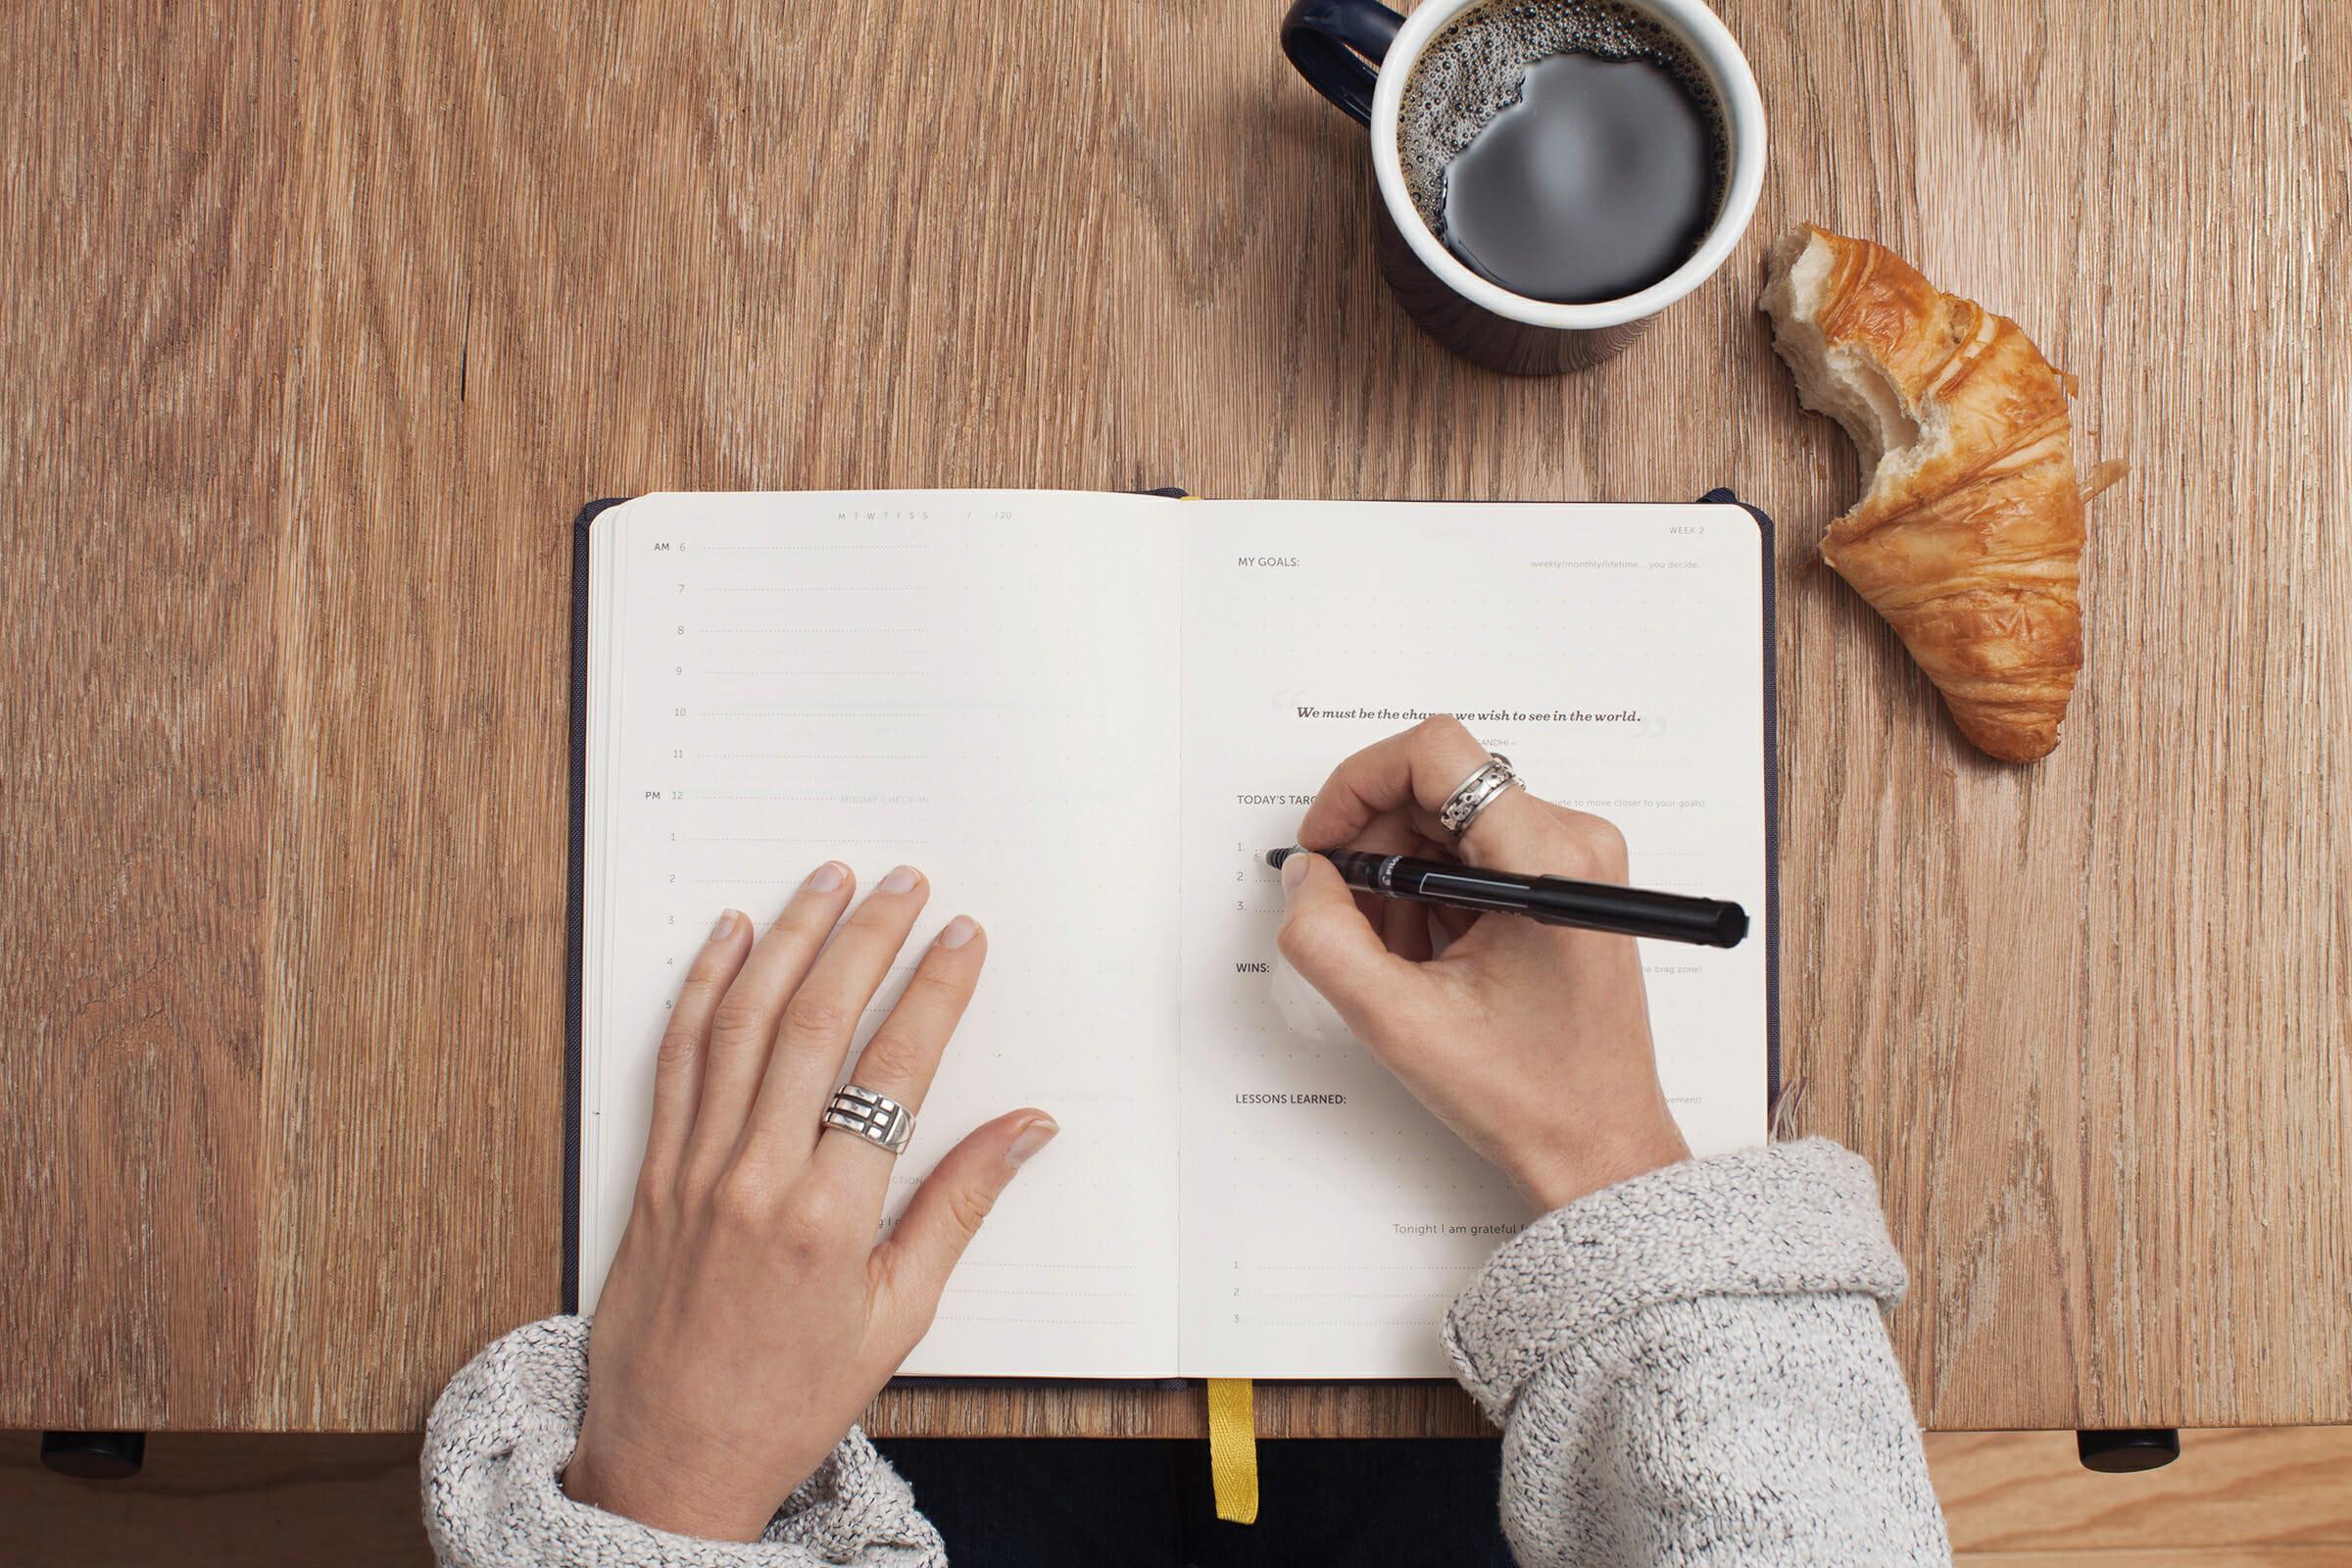 keep track of your progress - failedsuccessfully.com